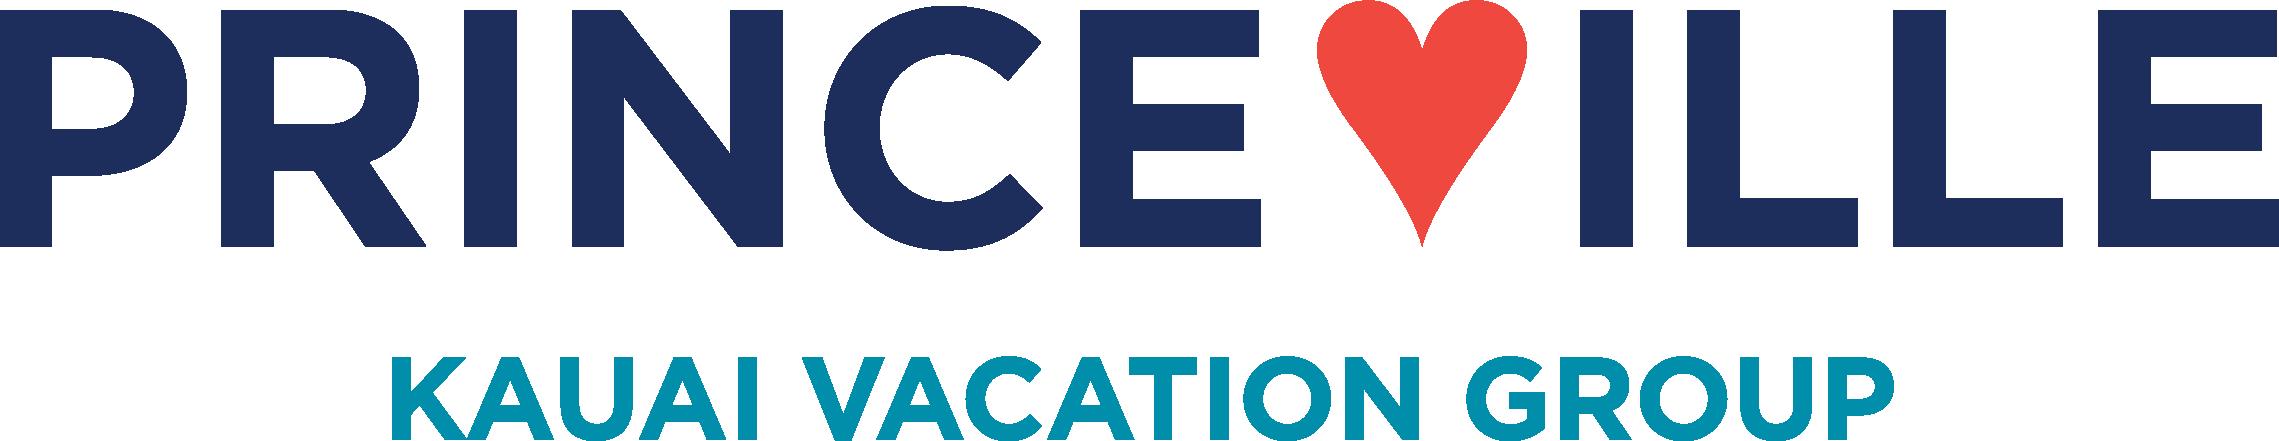 princeville-logo.png